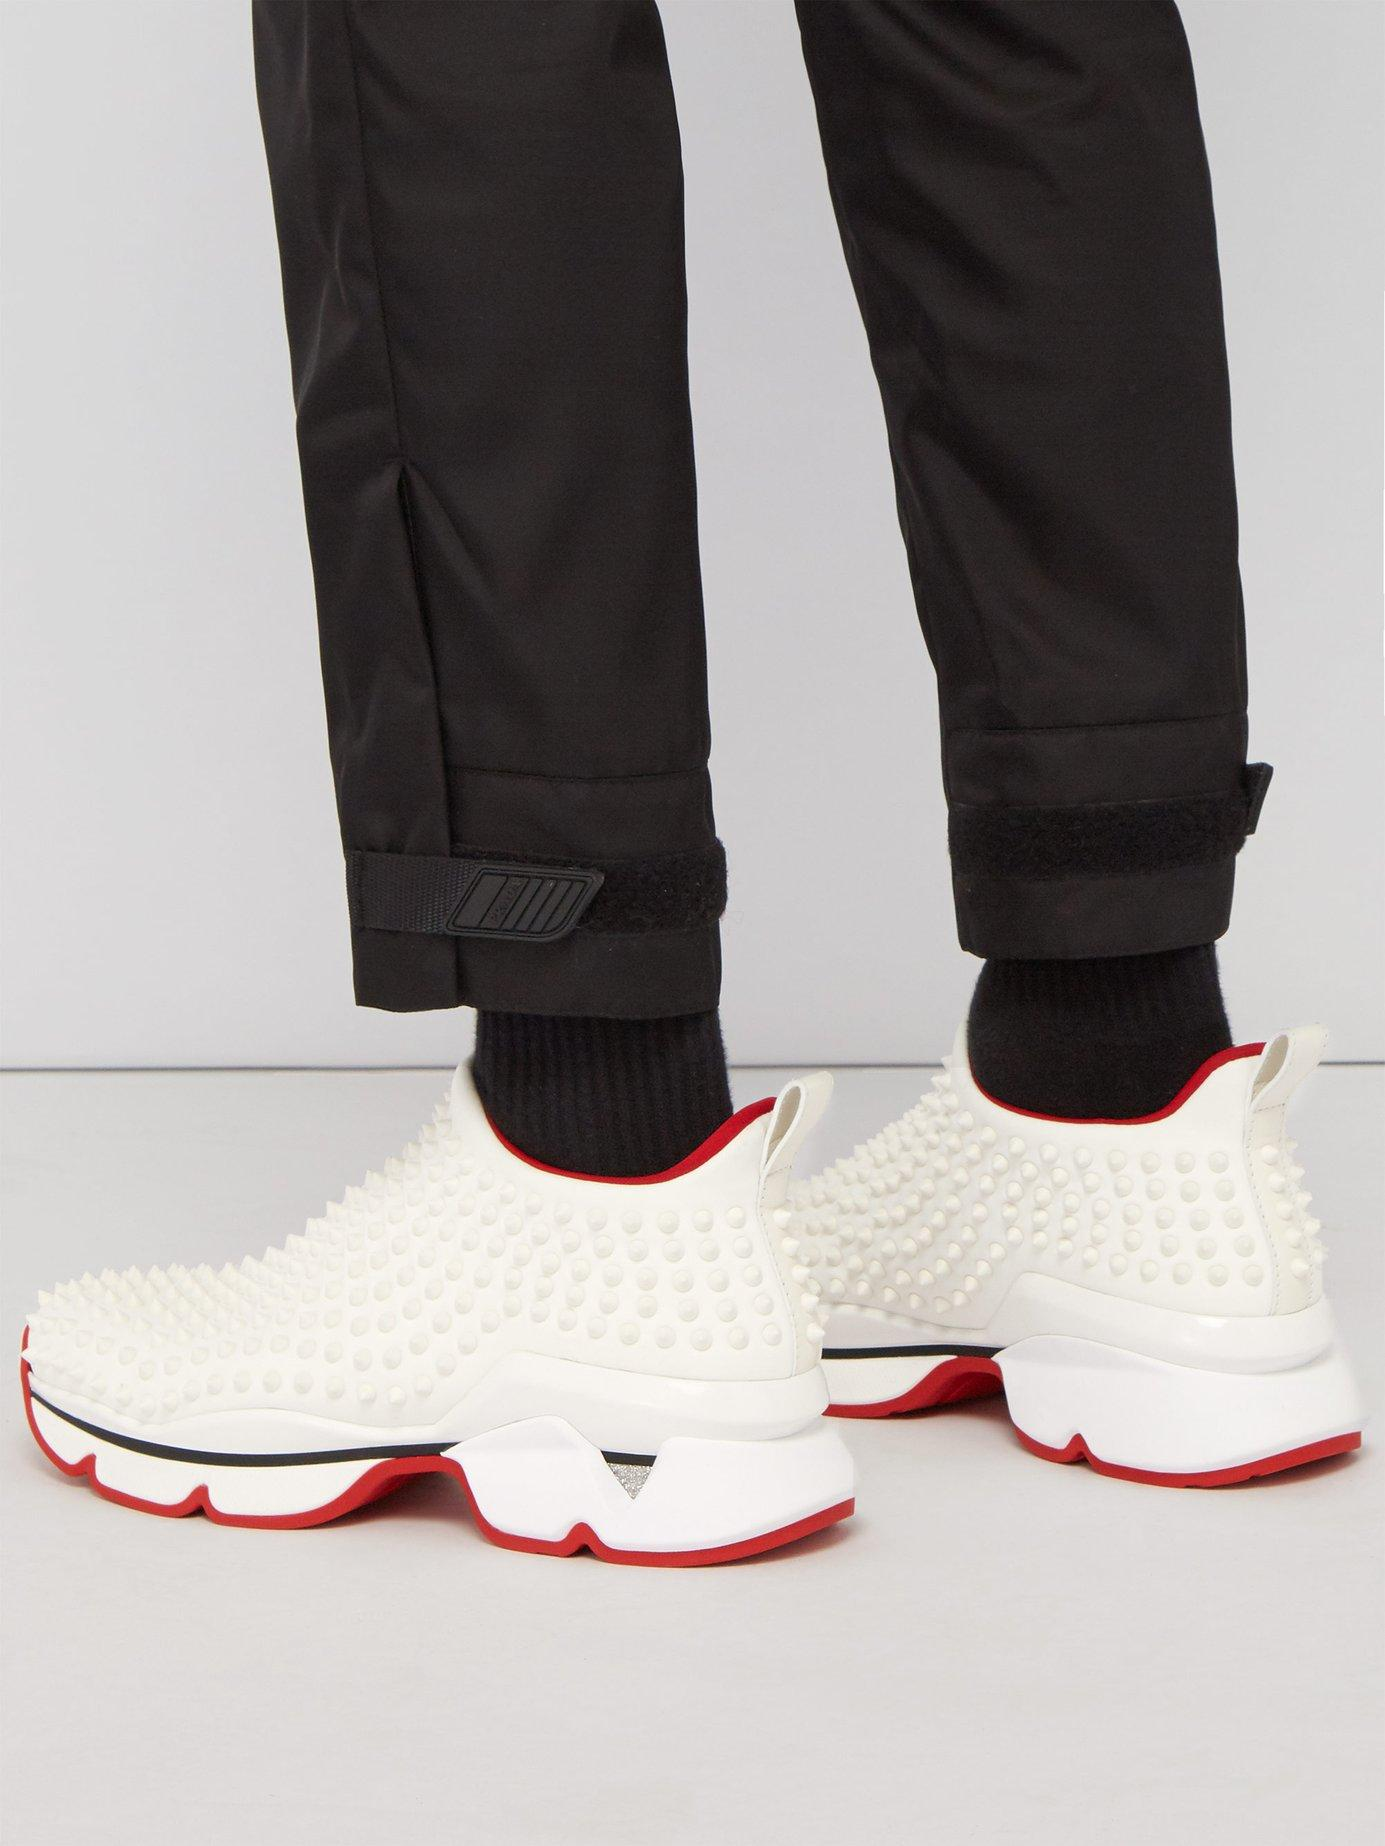 4eb8ff42db06 Lyst - Christian Louboutin Spike Embellished Neoprene Sock Trainers in  White for Men